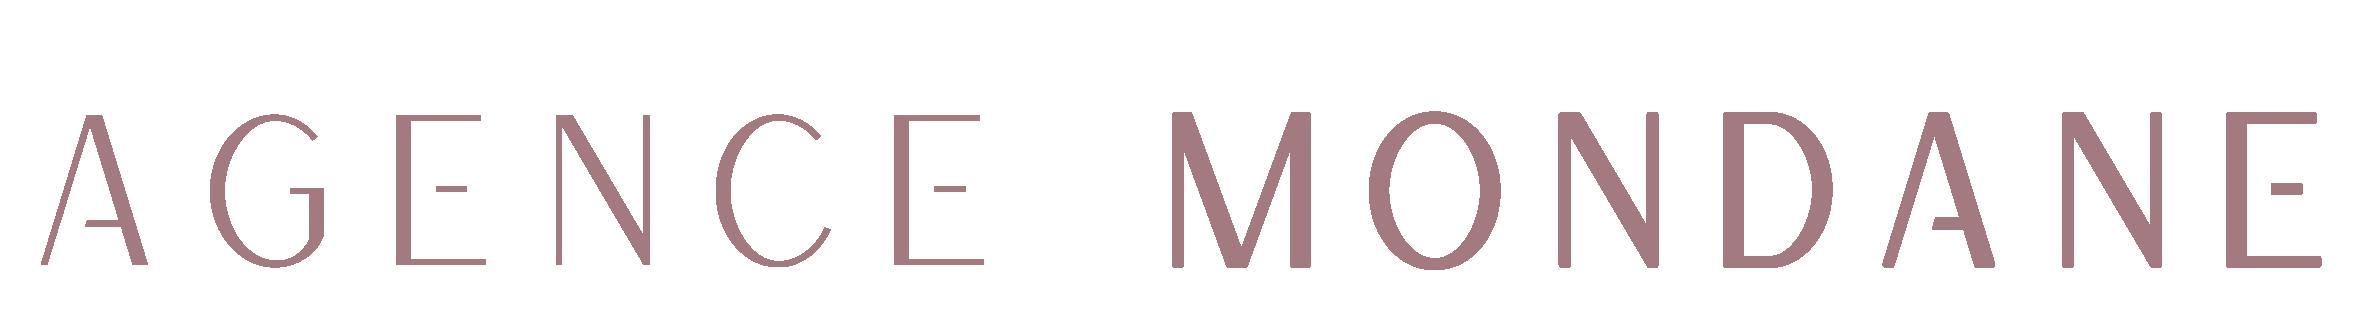 Agence Mondane